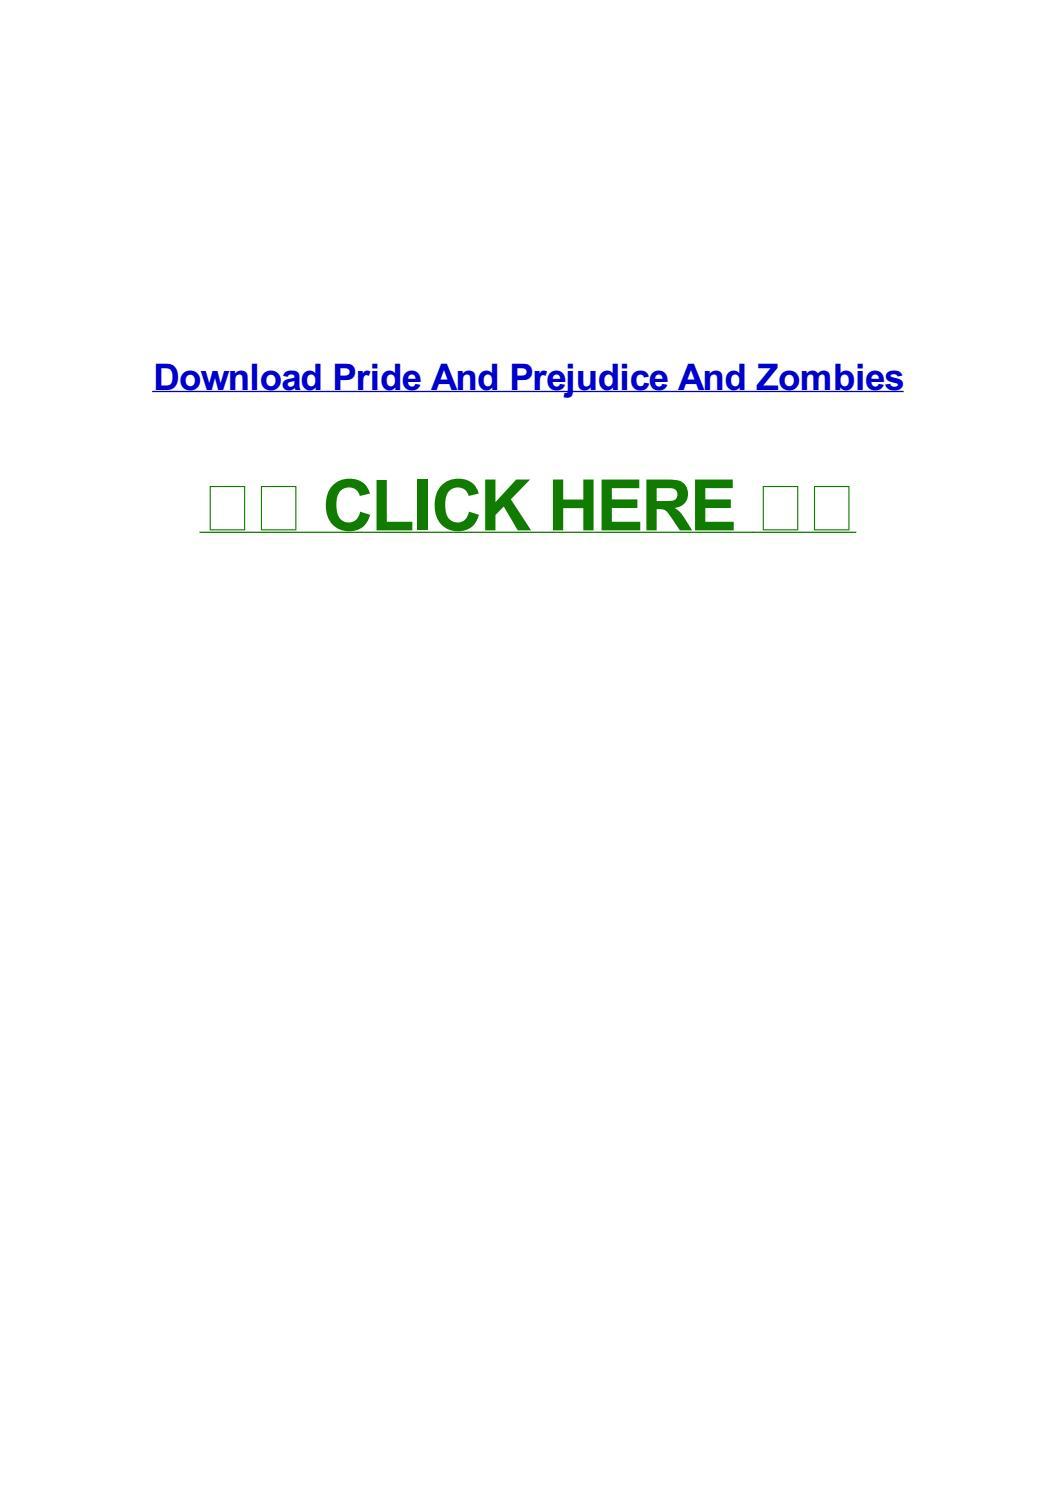 pride and prejudice movie free download utorrent